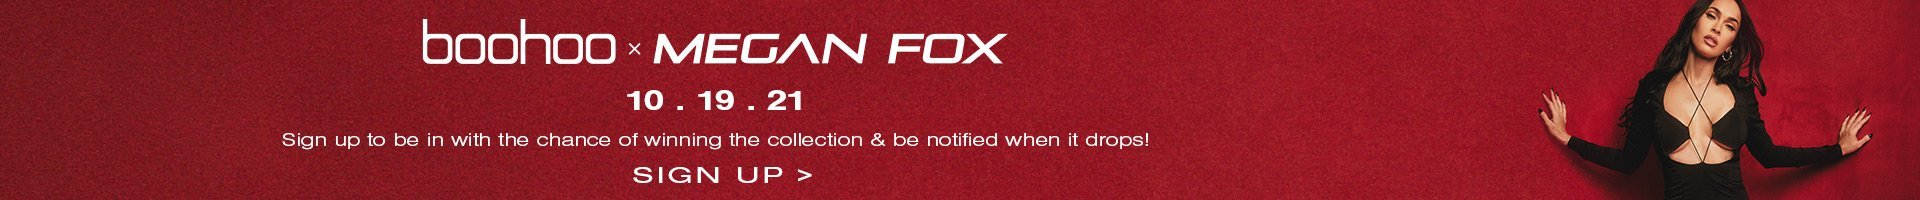 megan-fox-sign-up